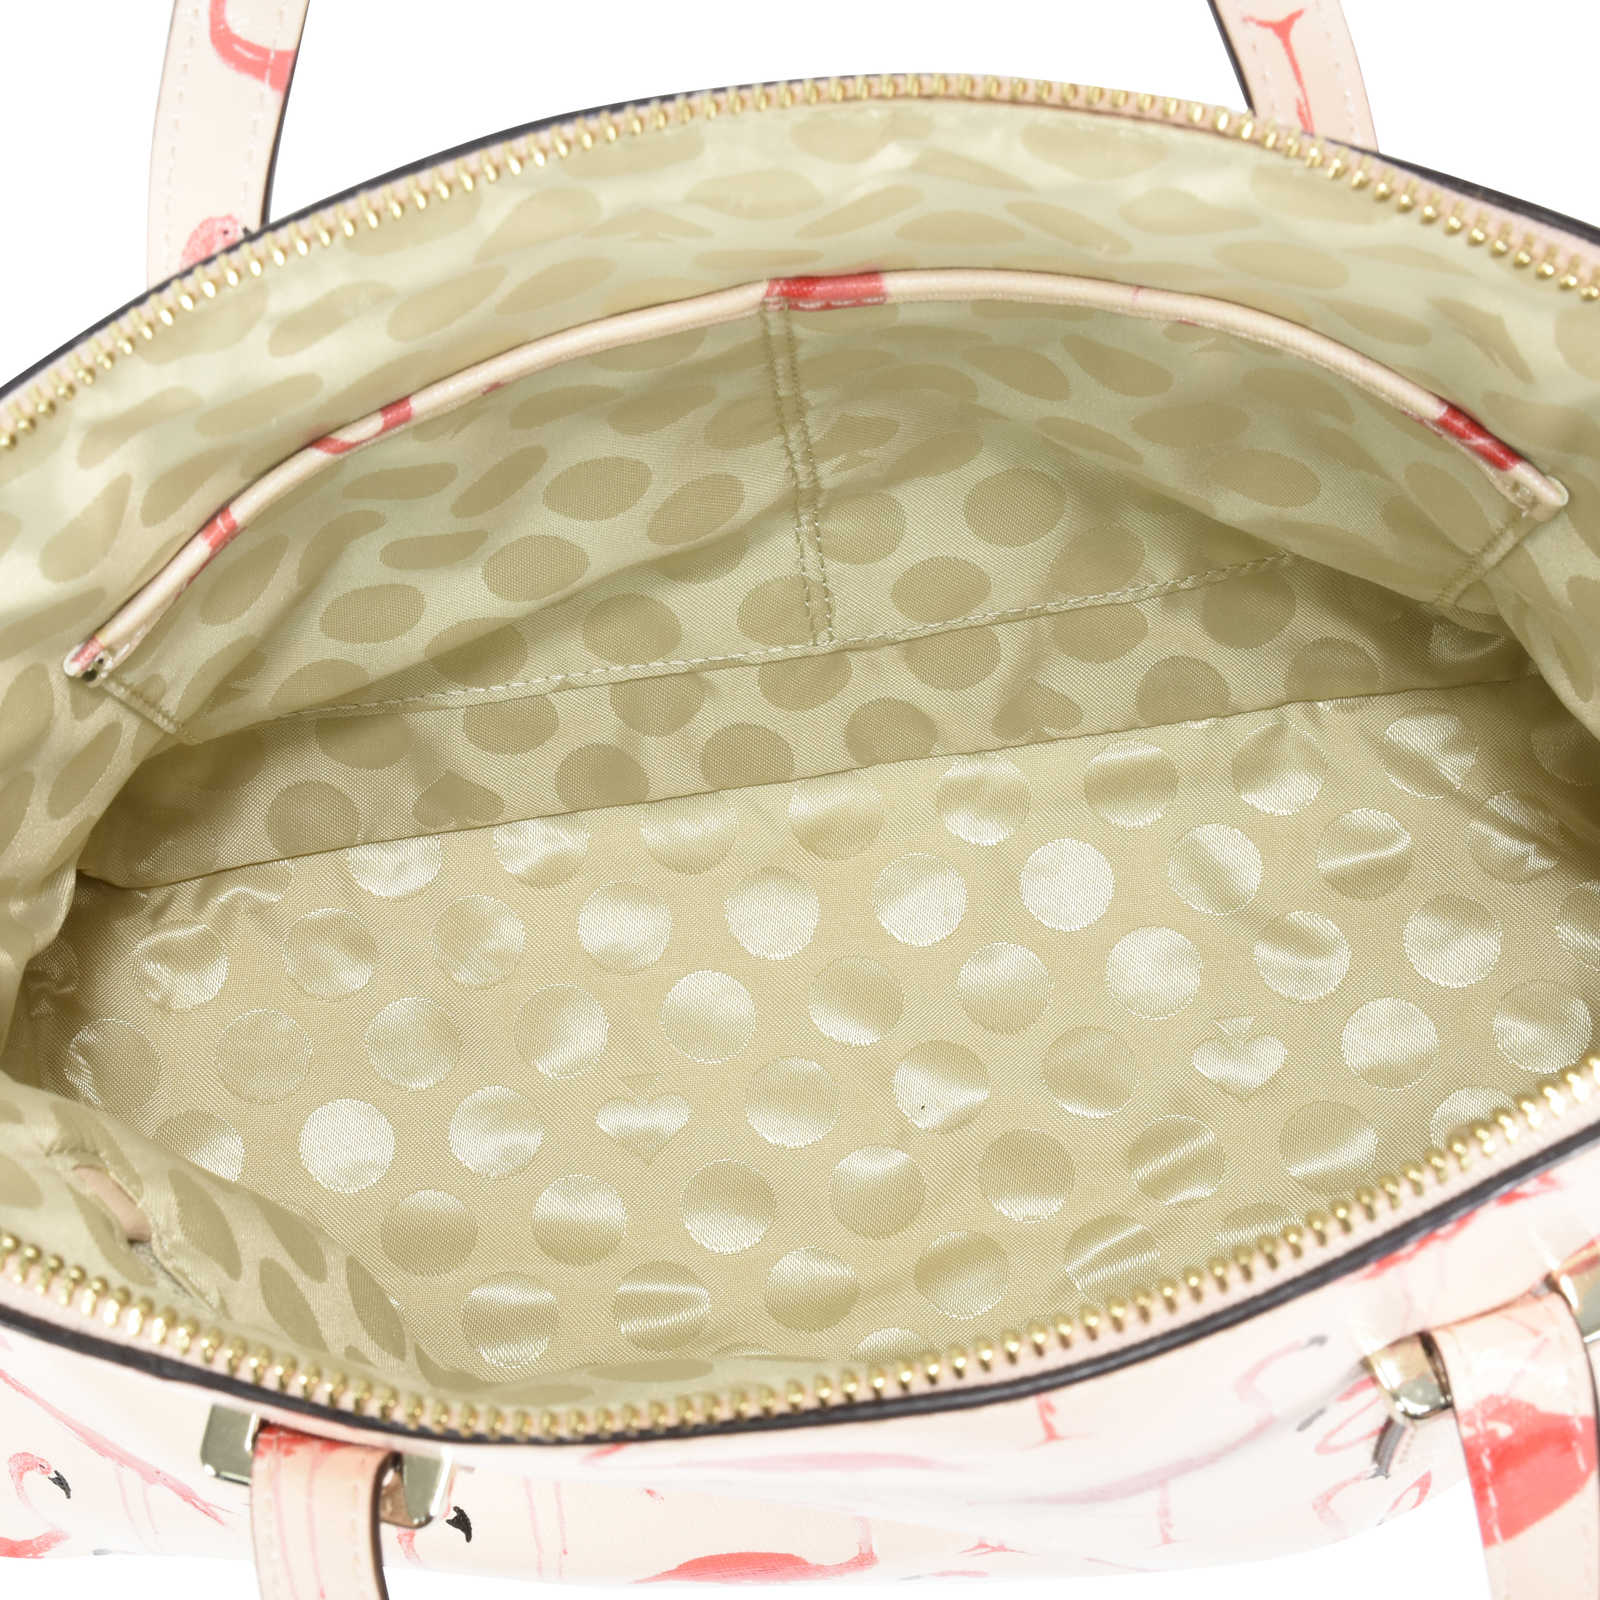 Authentic Pre Owned Kate Spade Flamingo Cedar Street Maise Bag Pss Katespade 361 00024